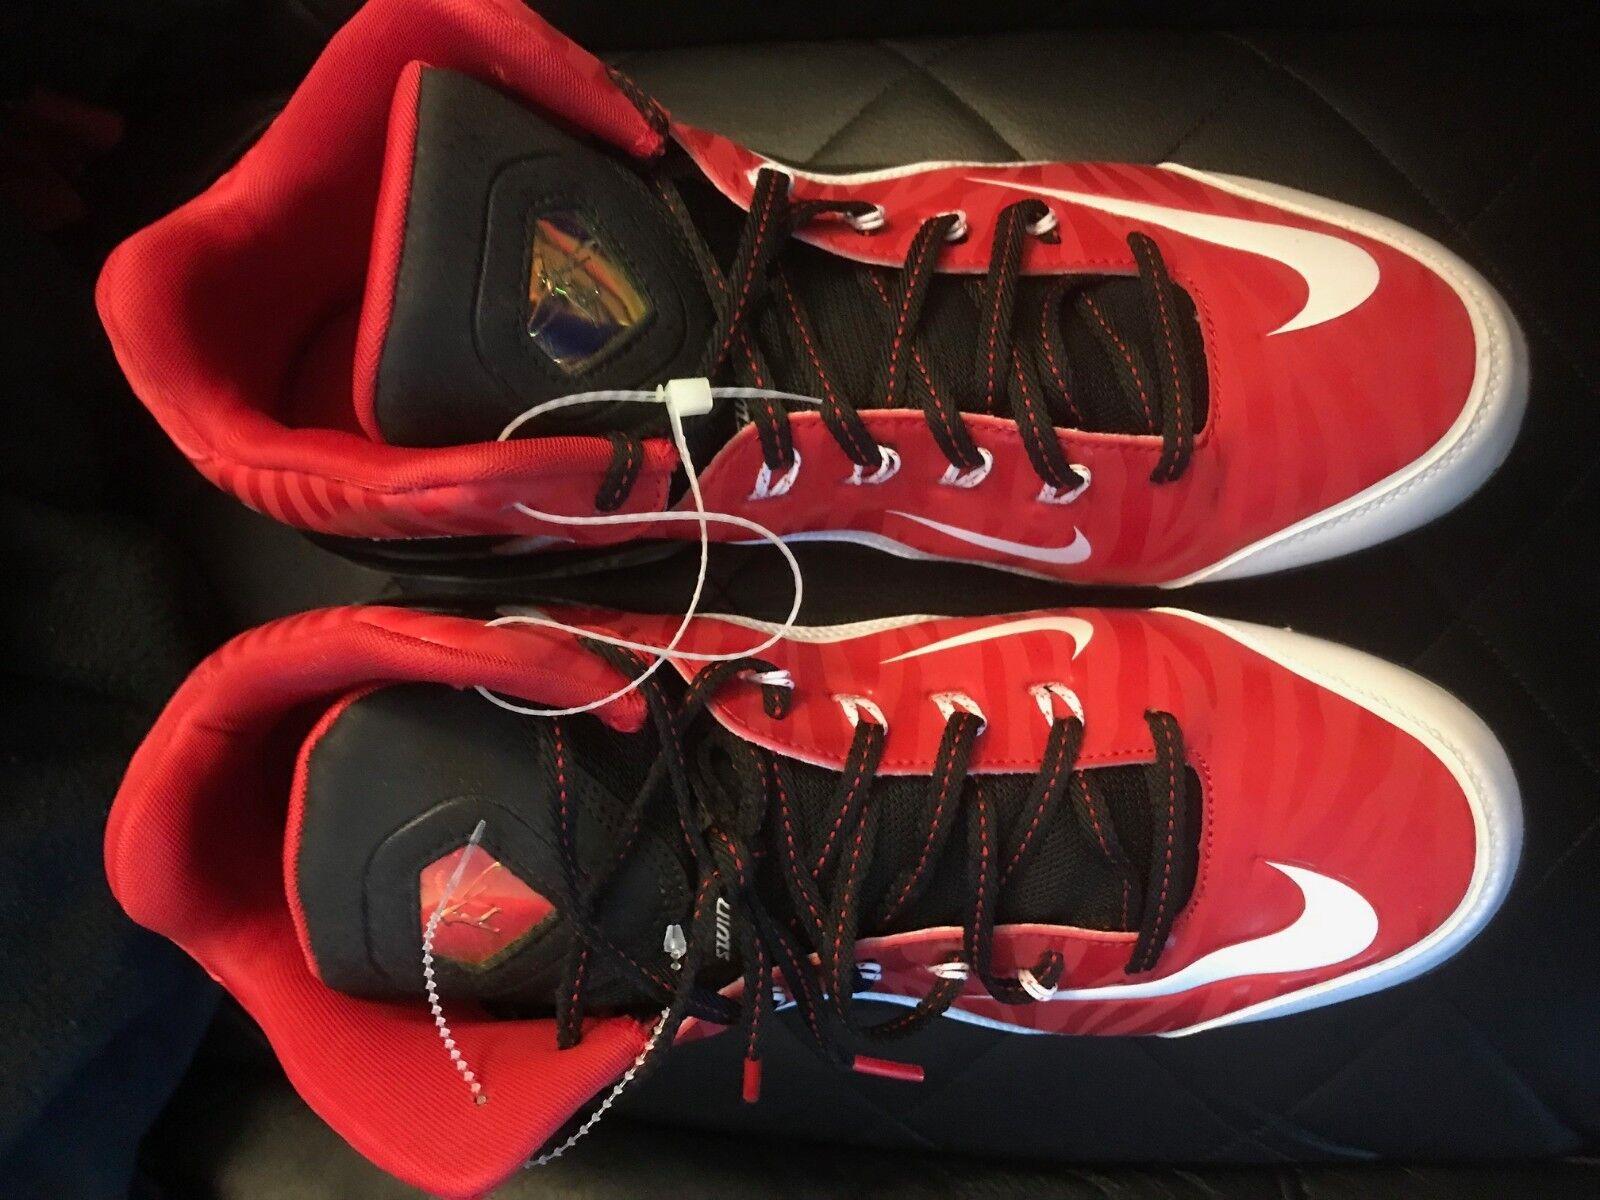 Nike griffey swingman cleats size 13 new reds